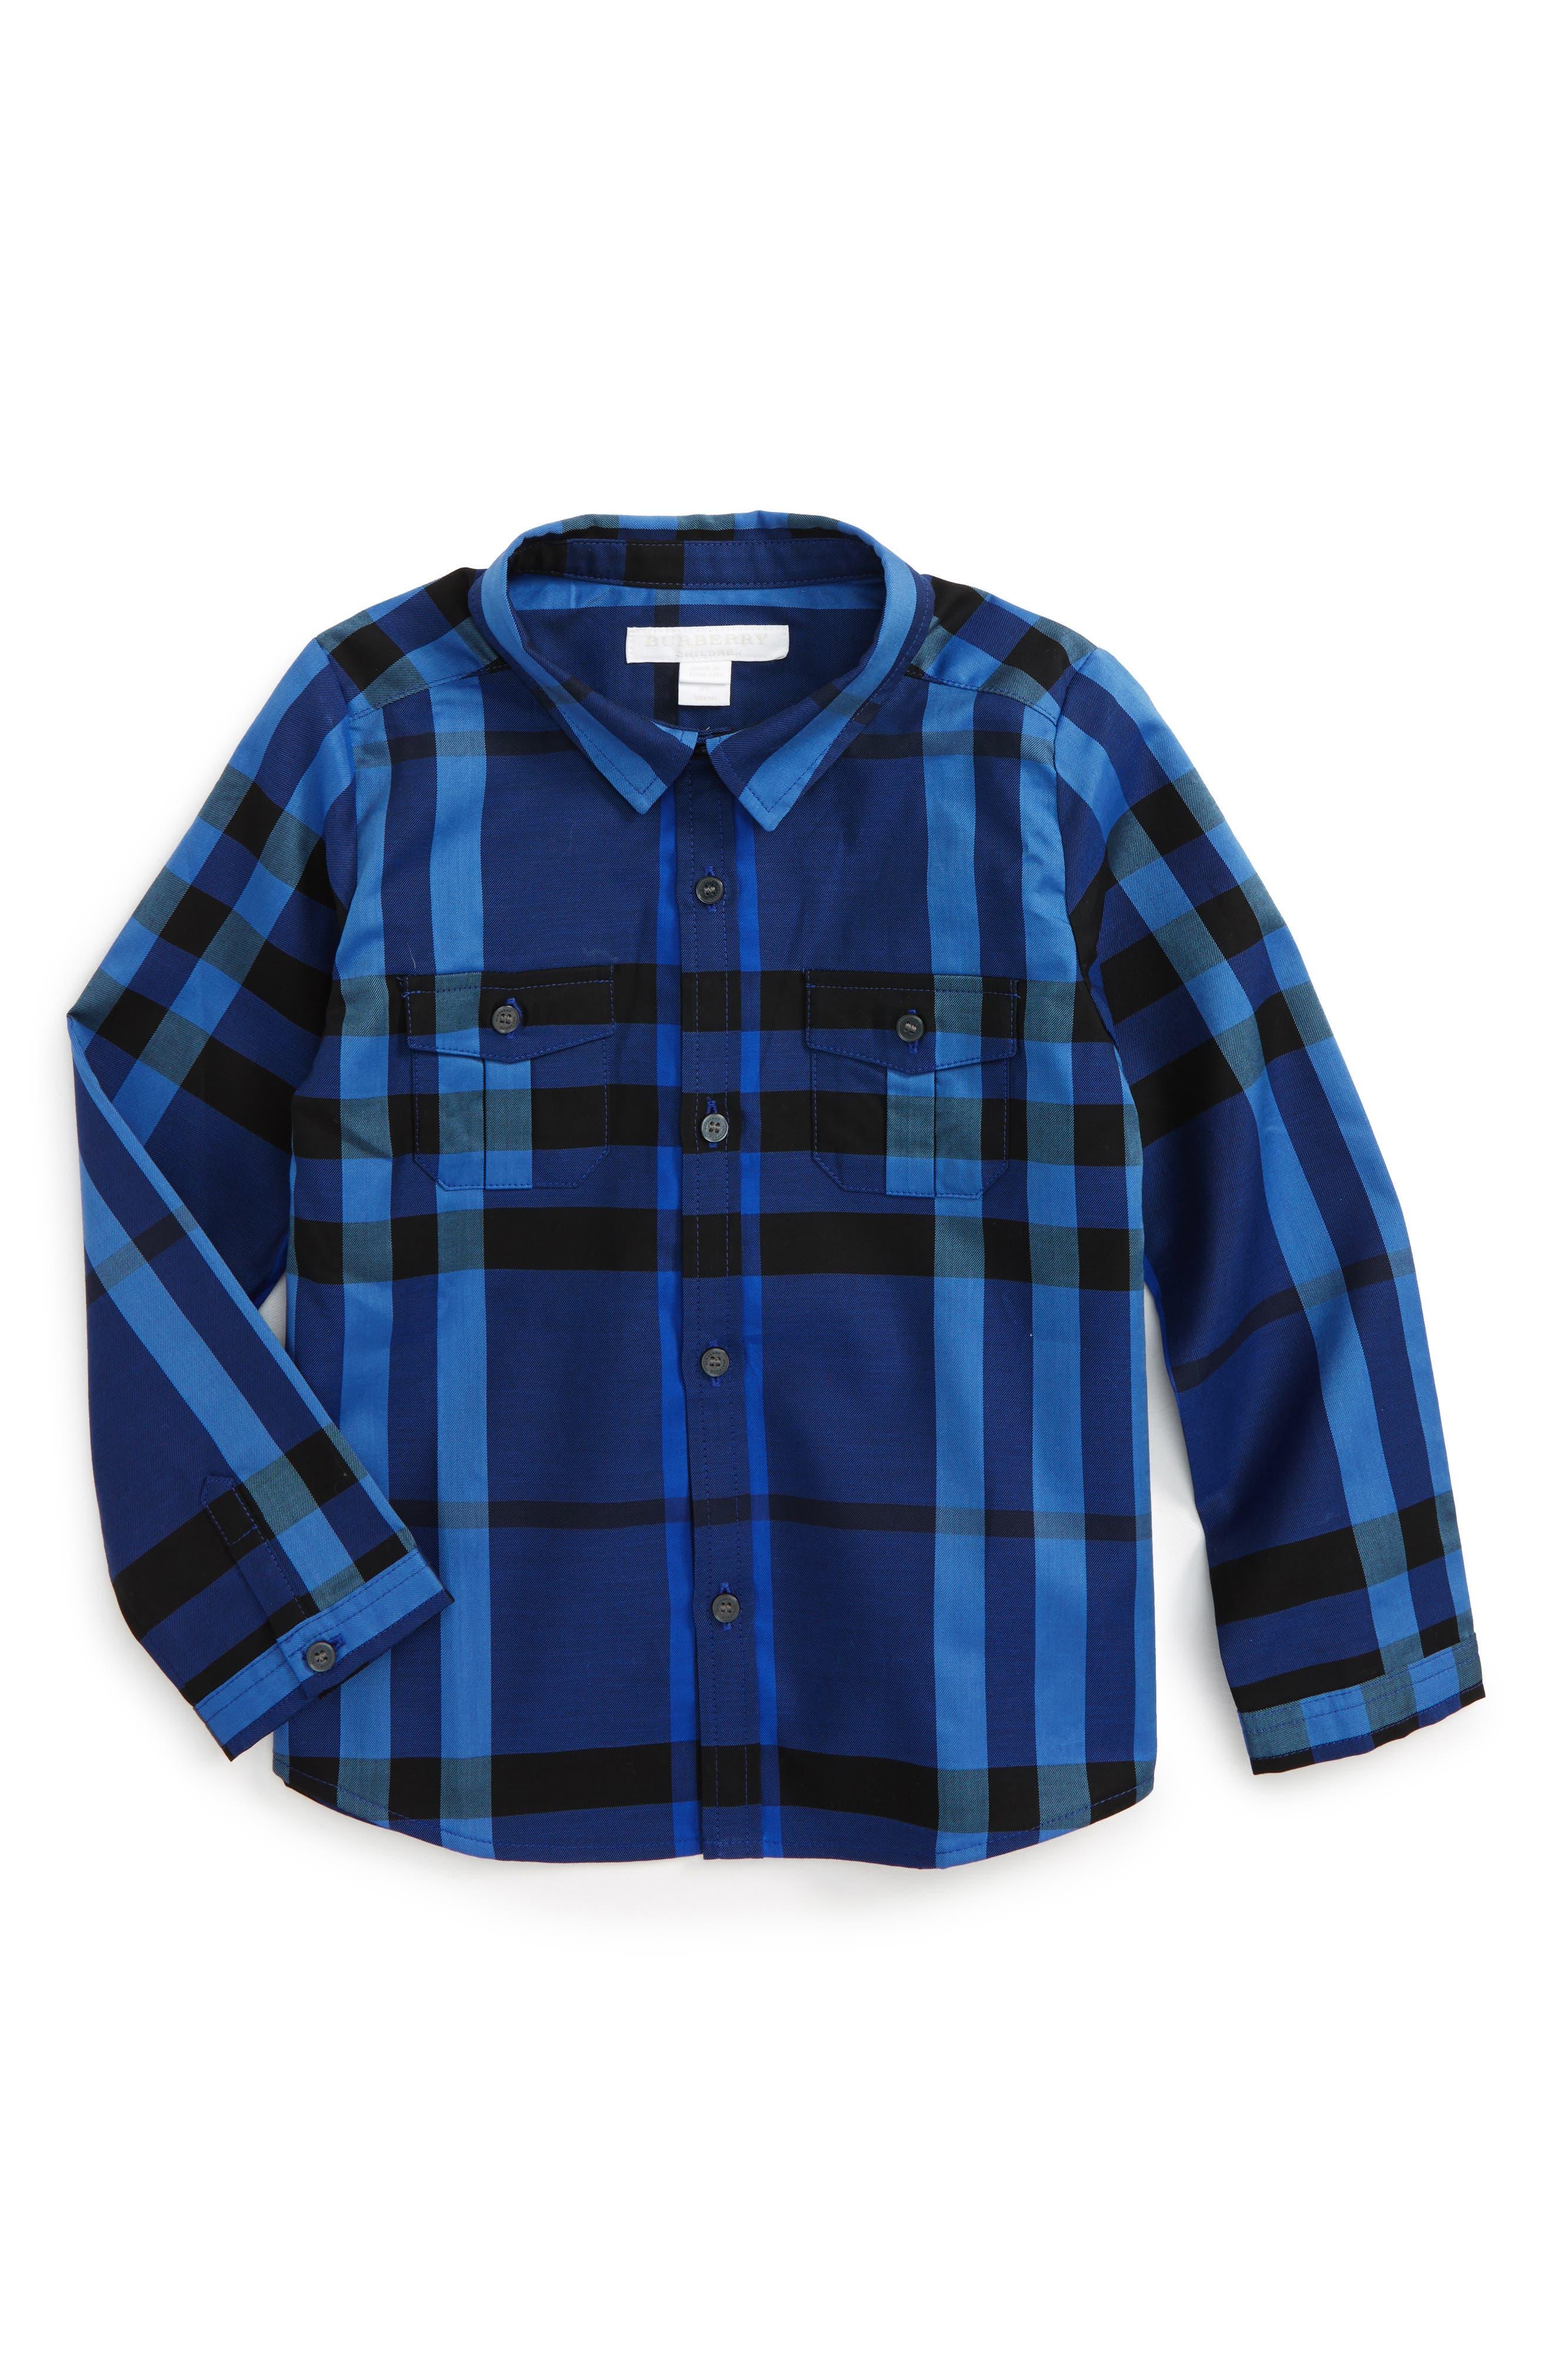 Burberry Trent Plaid Woven Shirt (Toddler Boys)